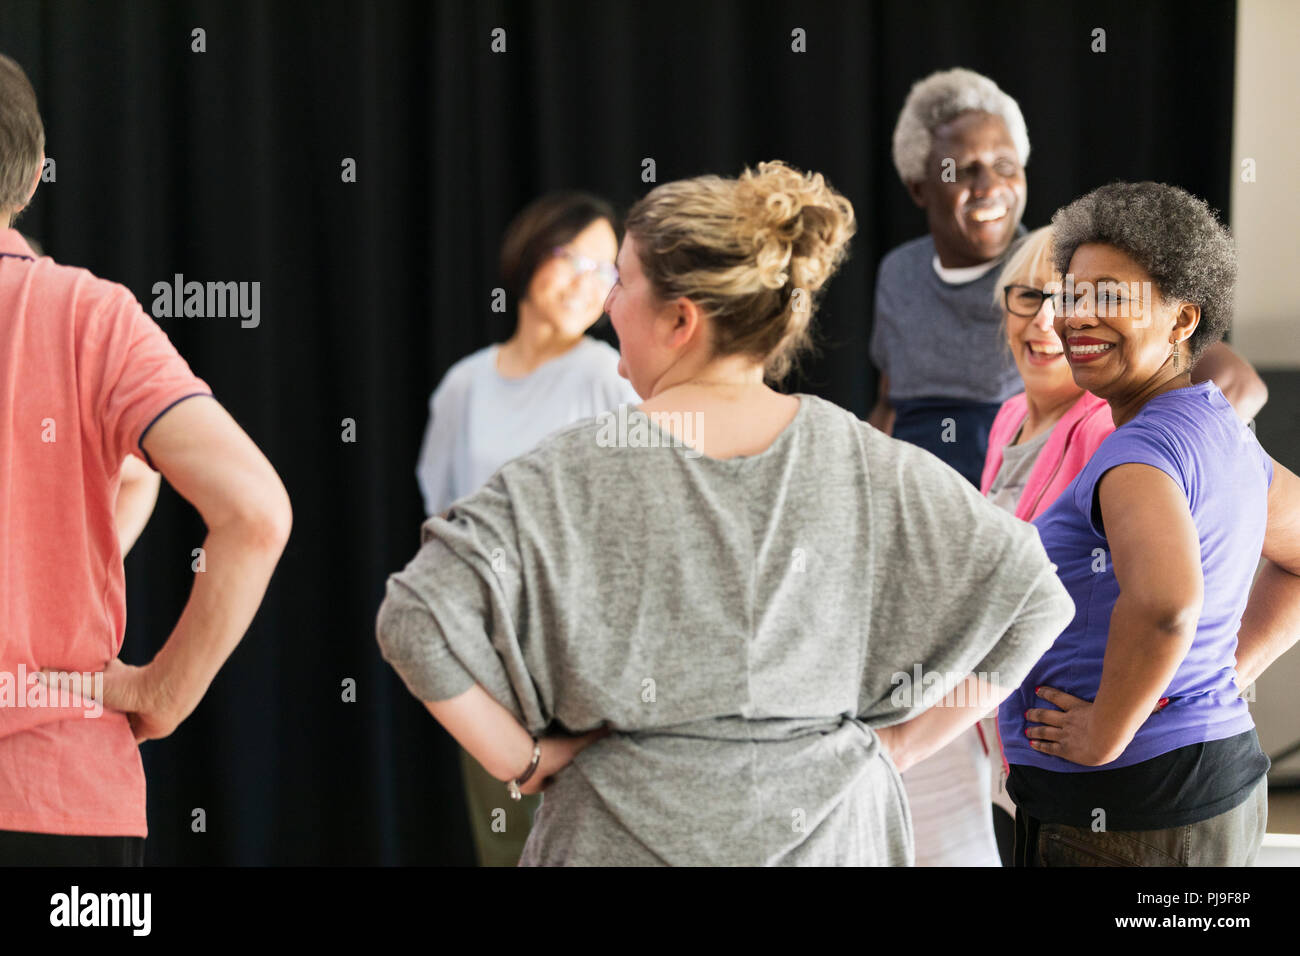 Smiling active seniors exercising in circle - Stock Image